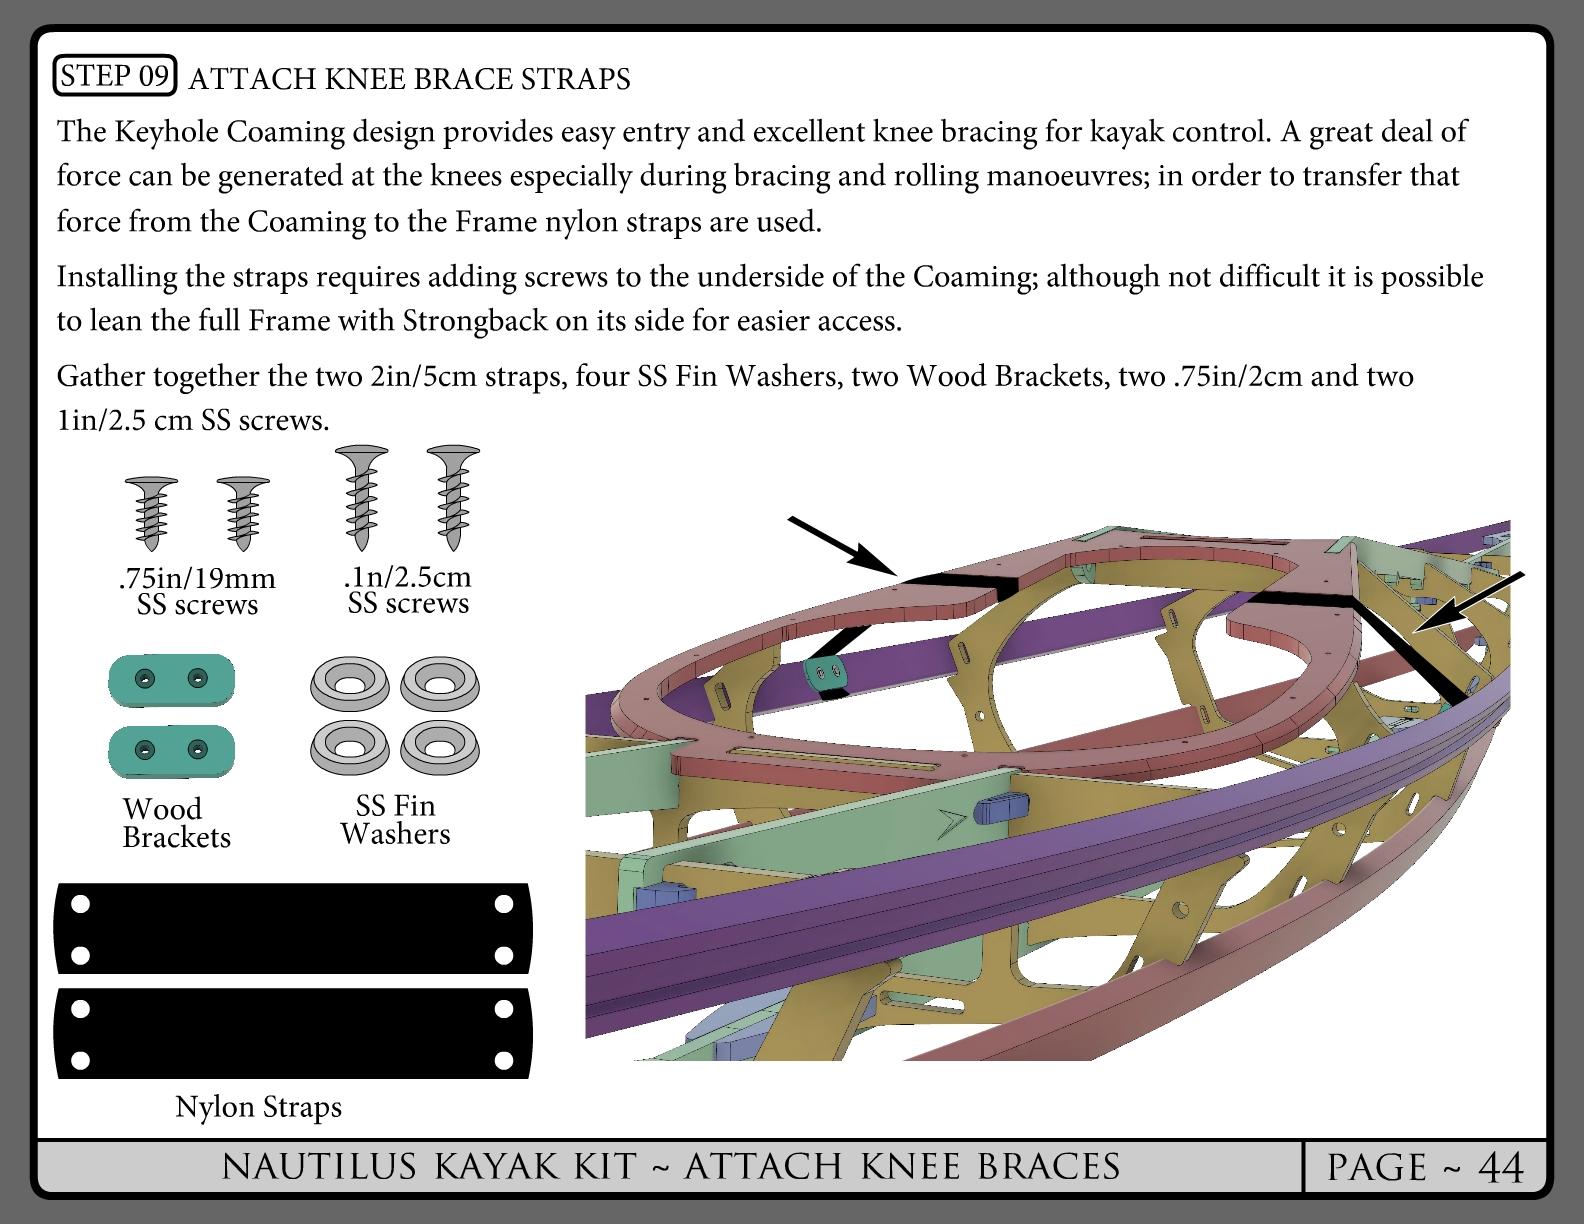 Nautilus Instructions_0047.jpg